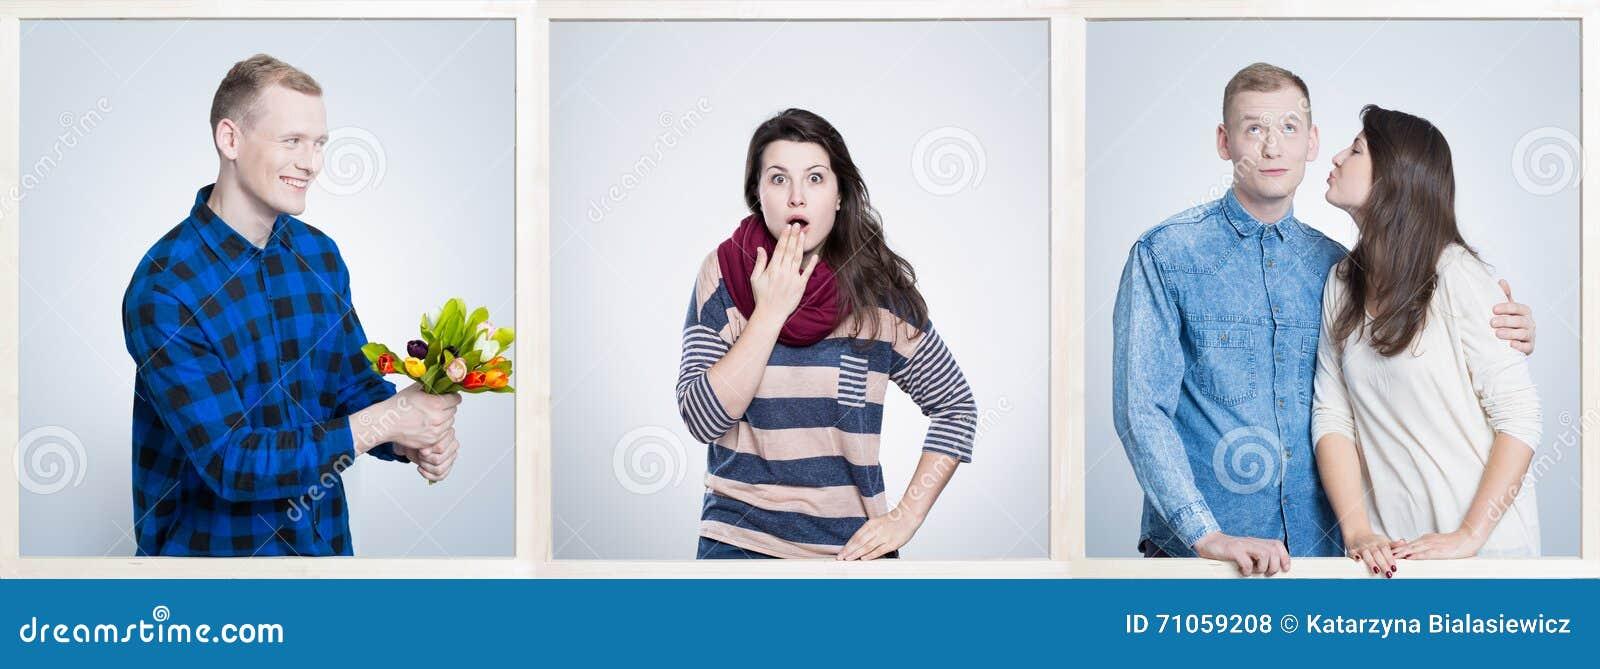 Free dating websites for single parents uk yahoo